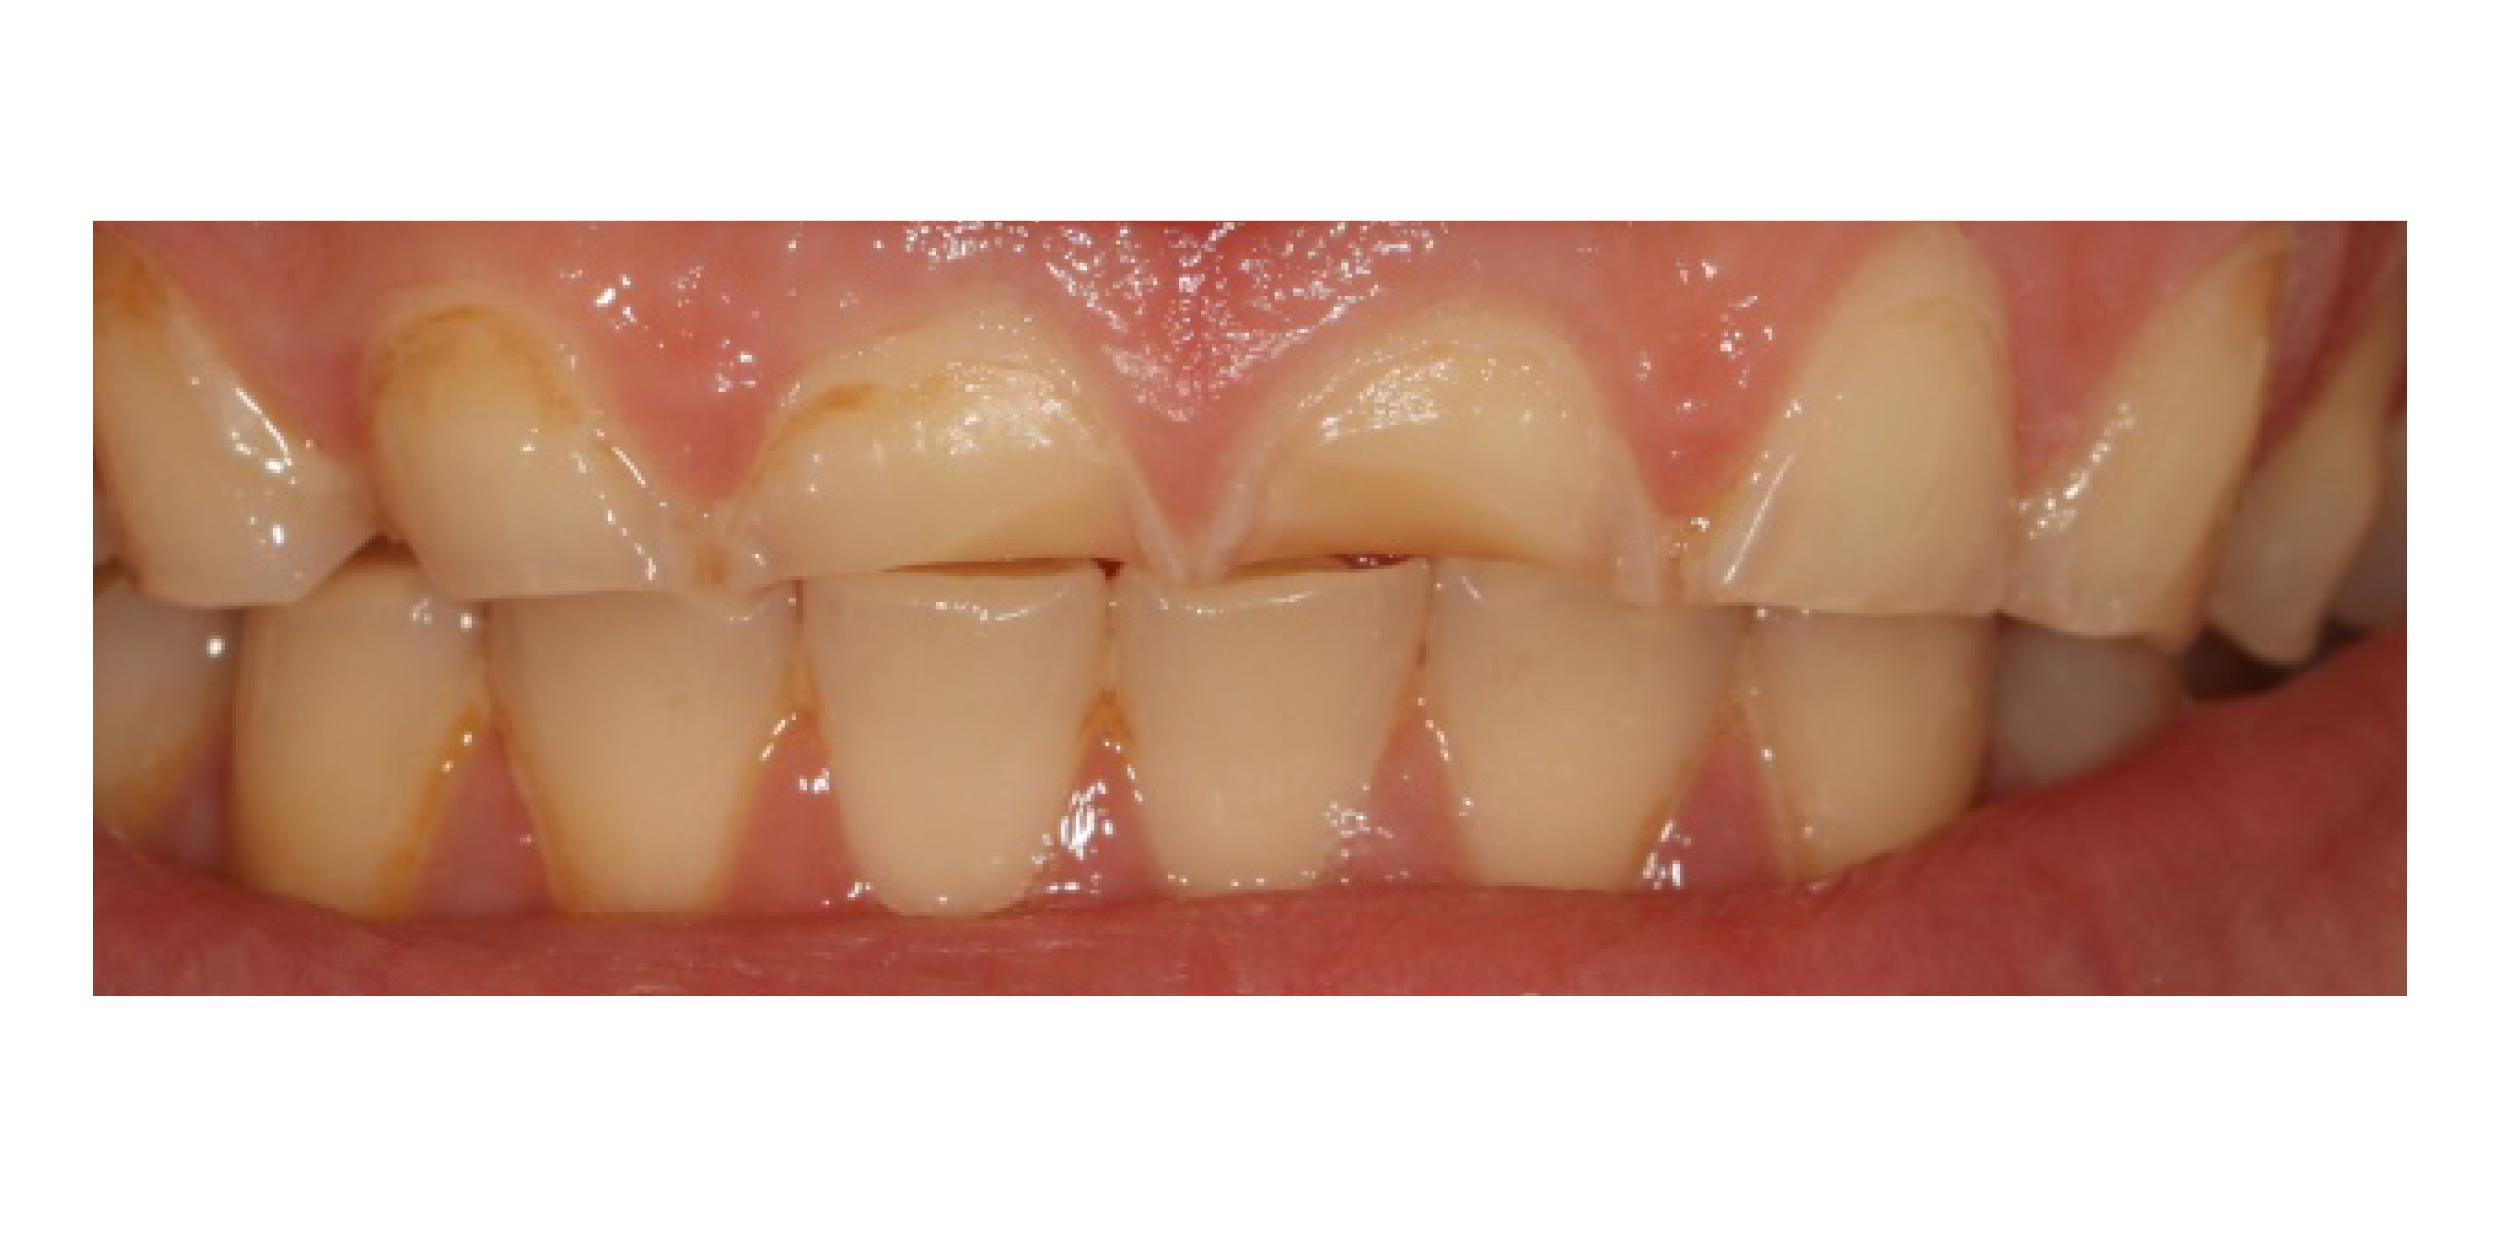 Prosthodontist specialist in Salisbury